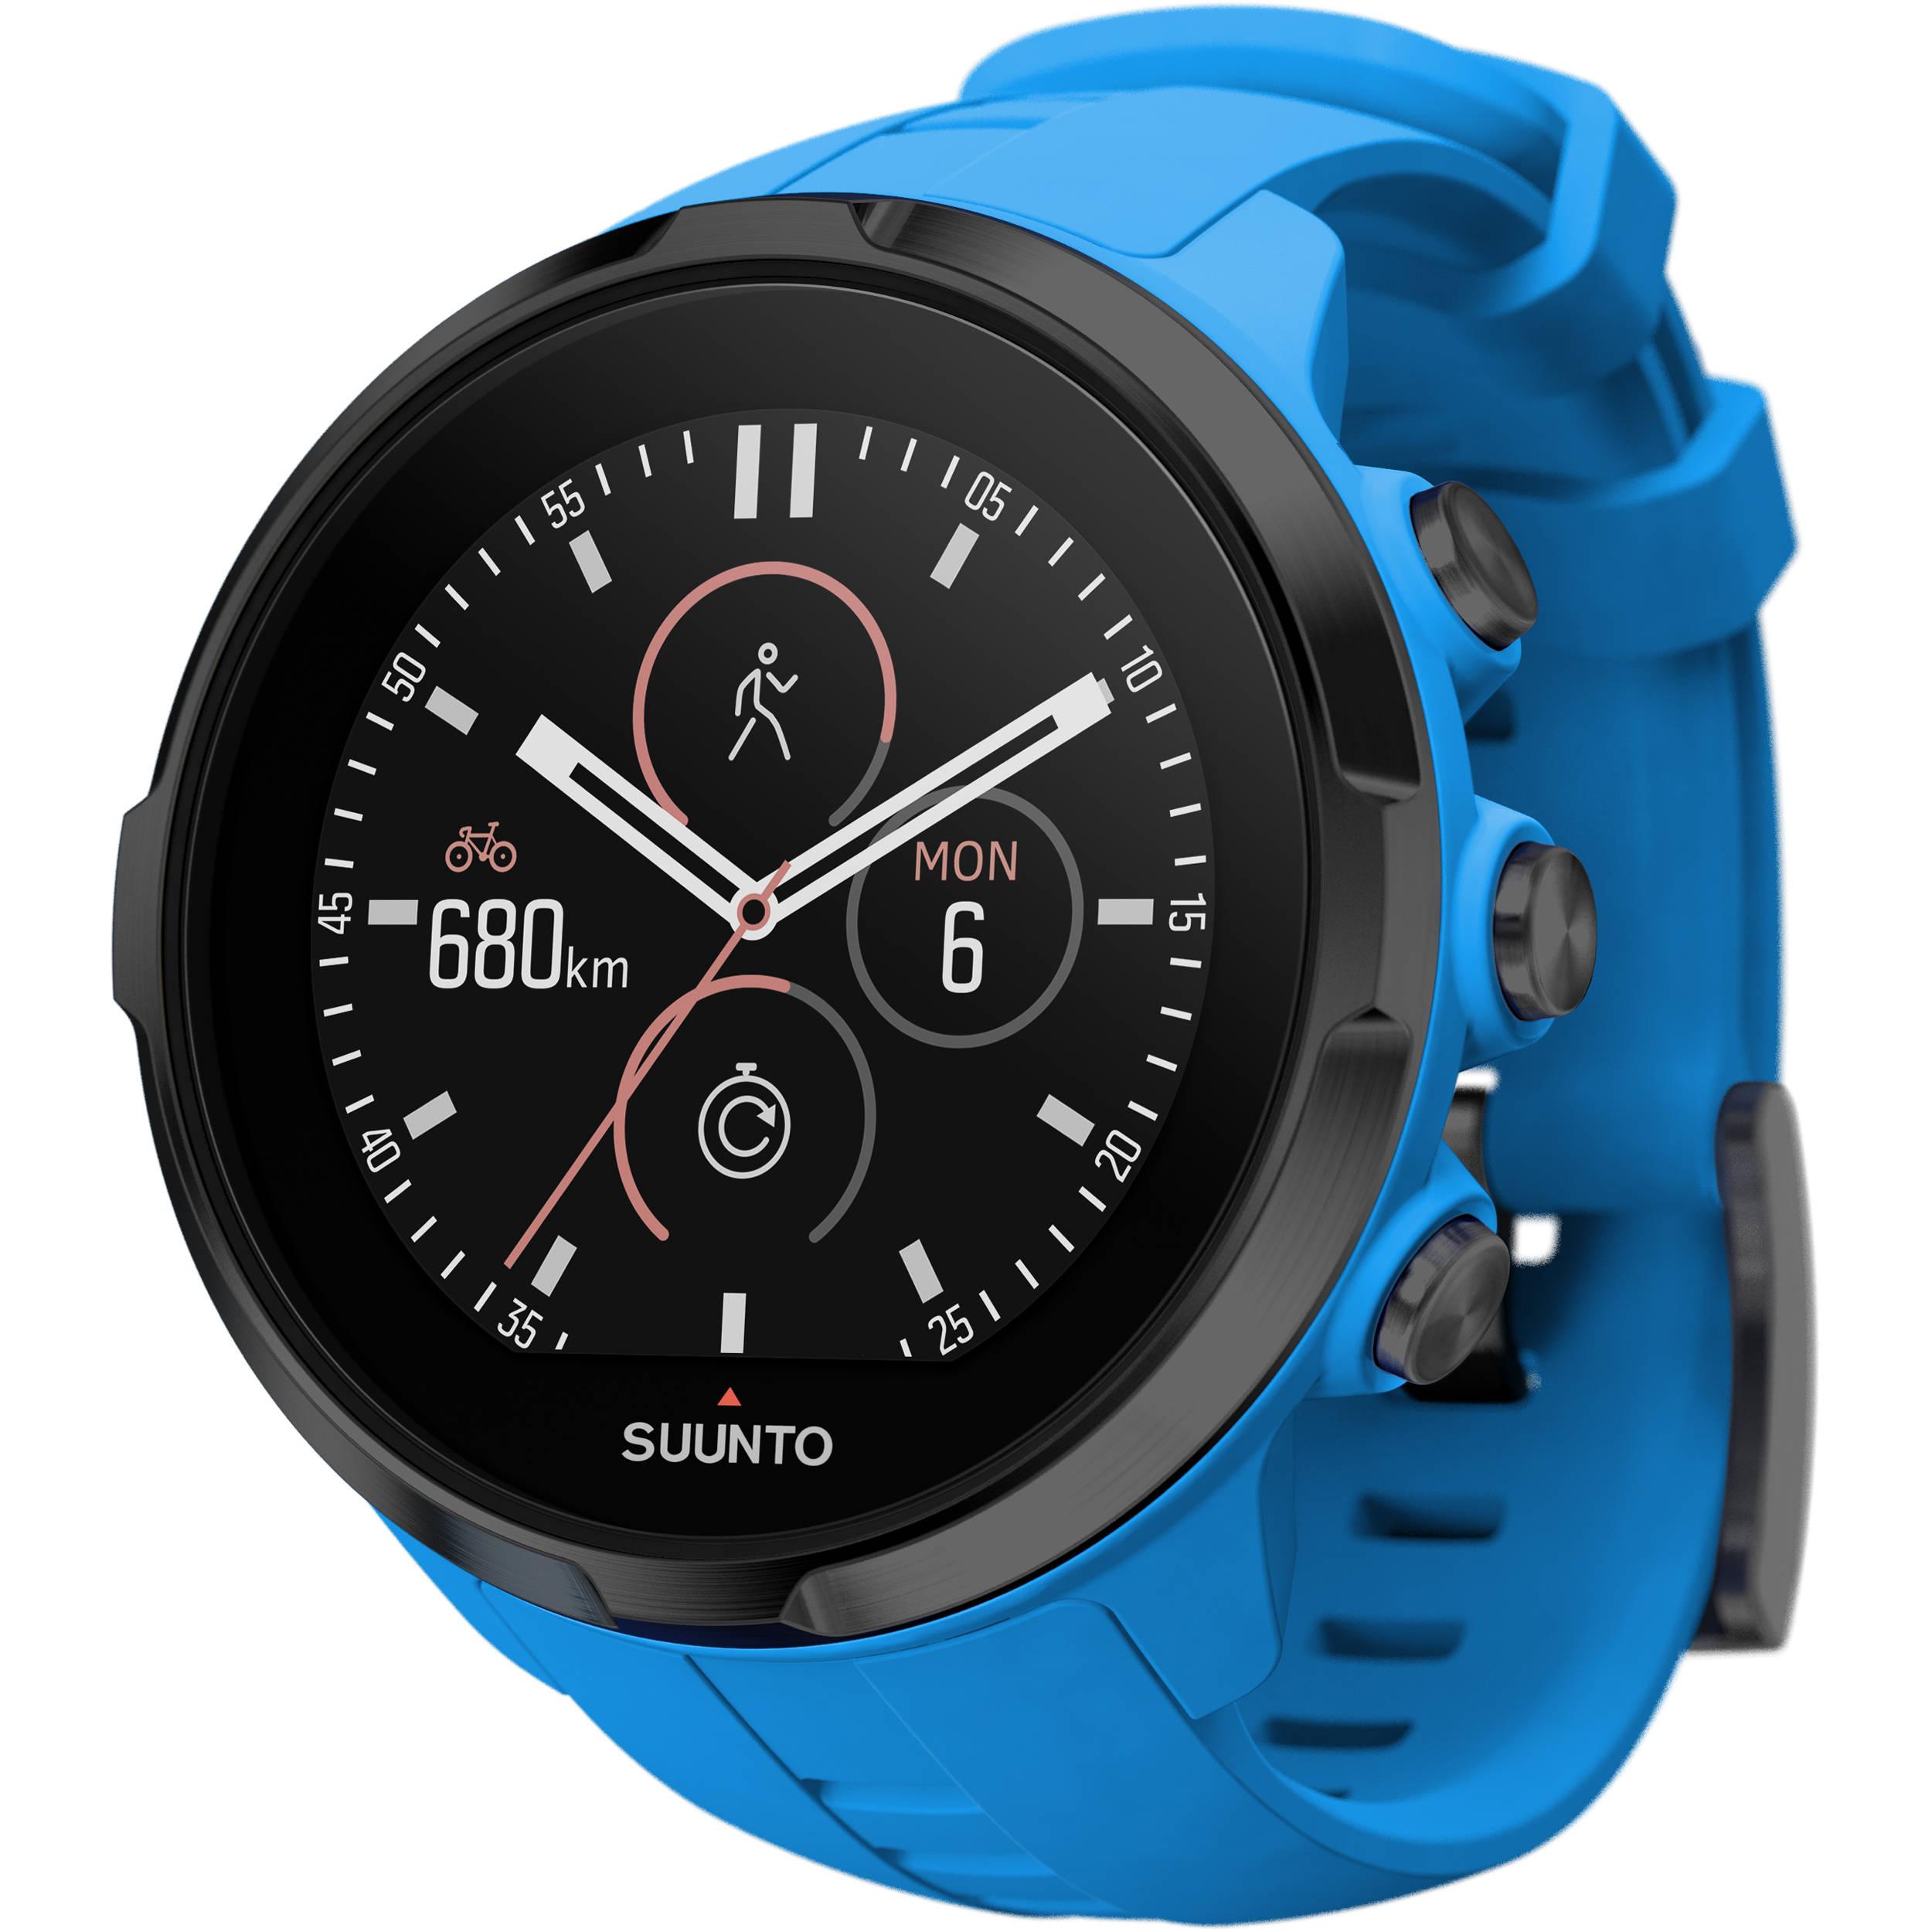 SUUNTO Spartan Sport Wrist HR Watch (Blue) SS022663000 B&H ...